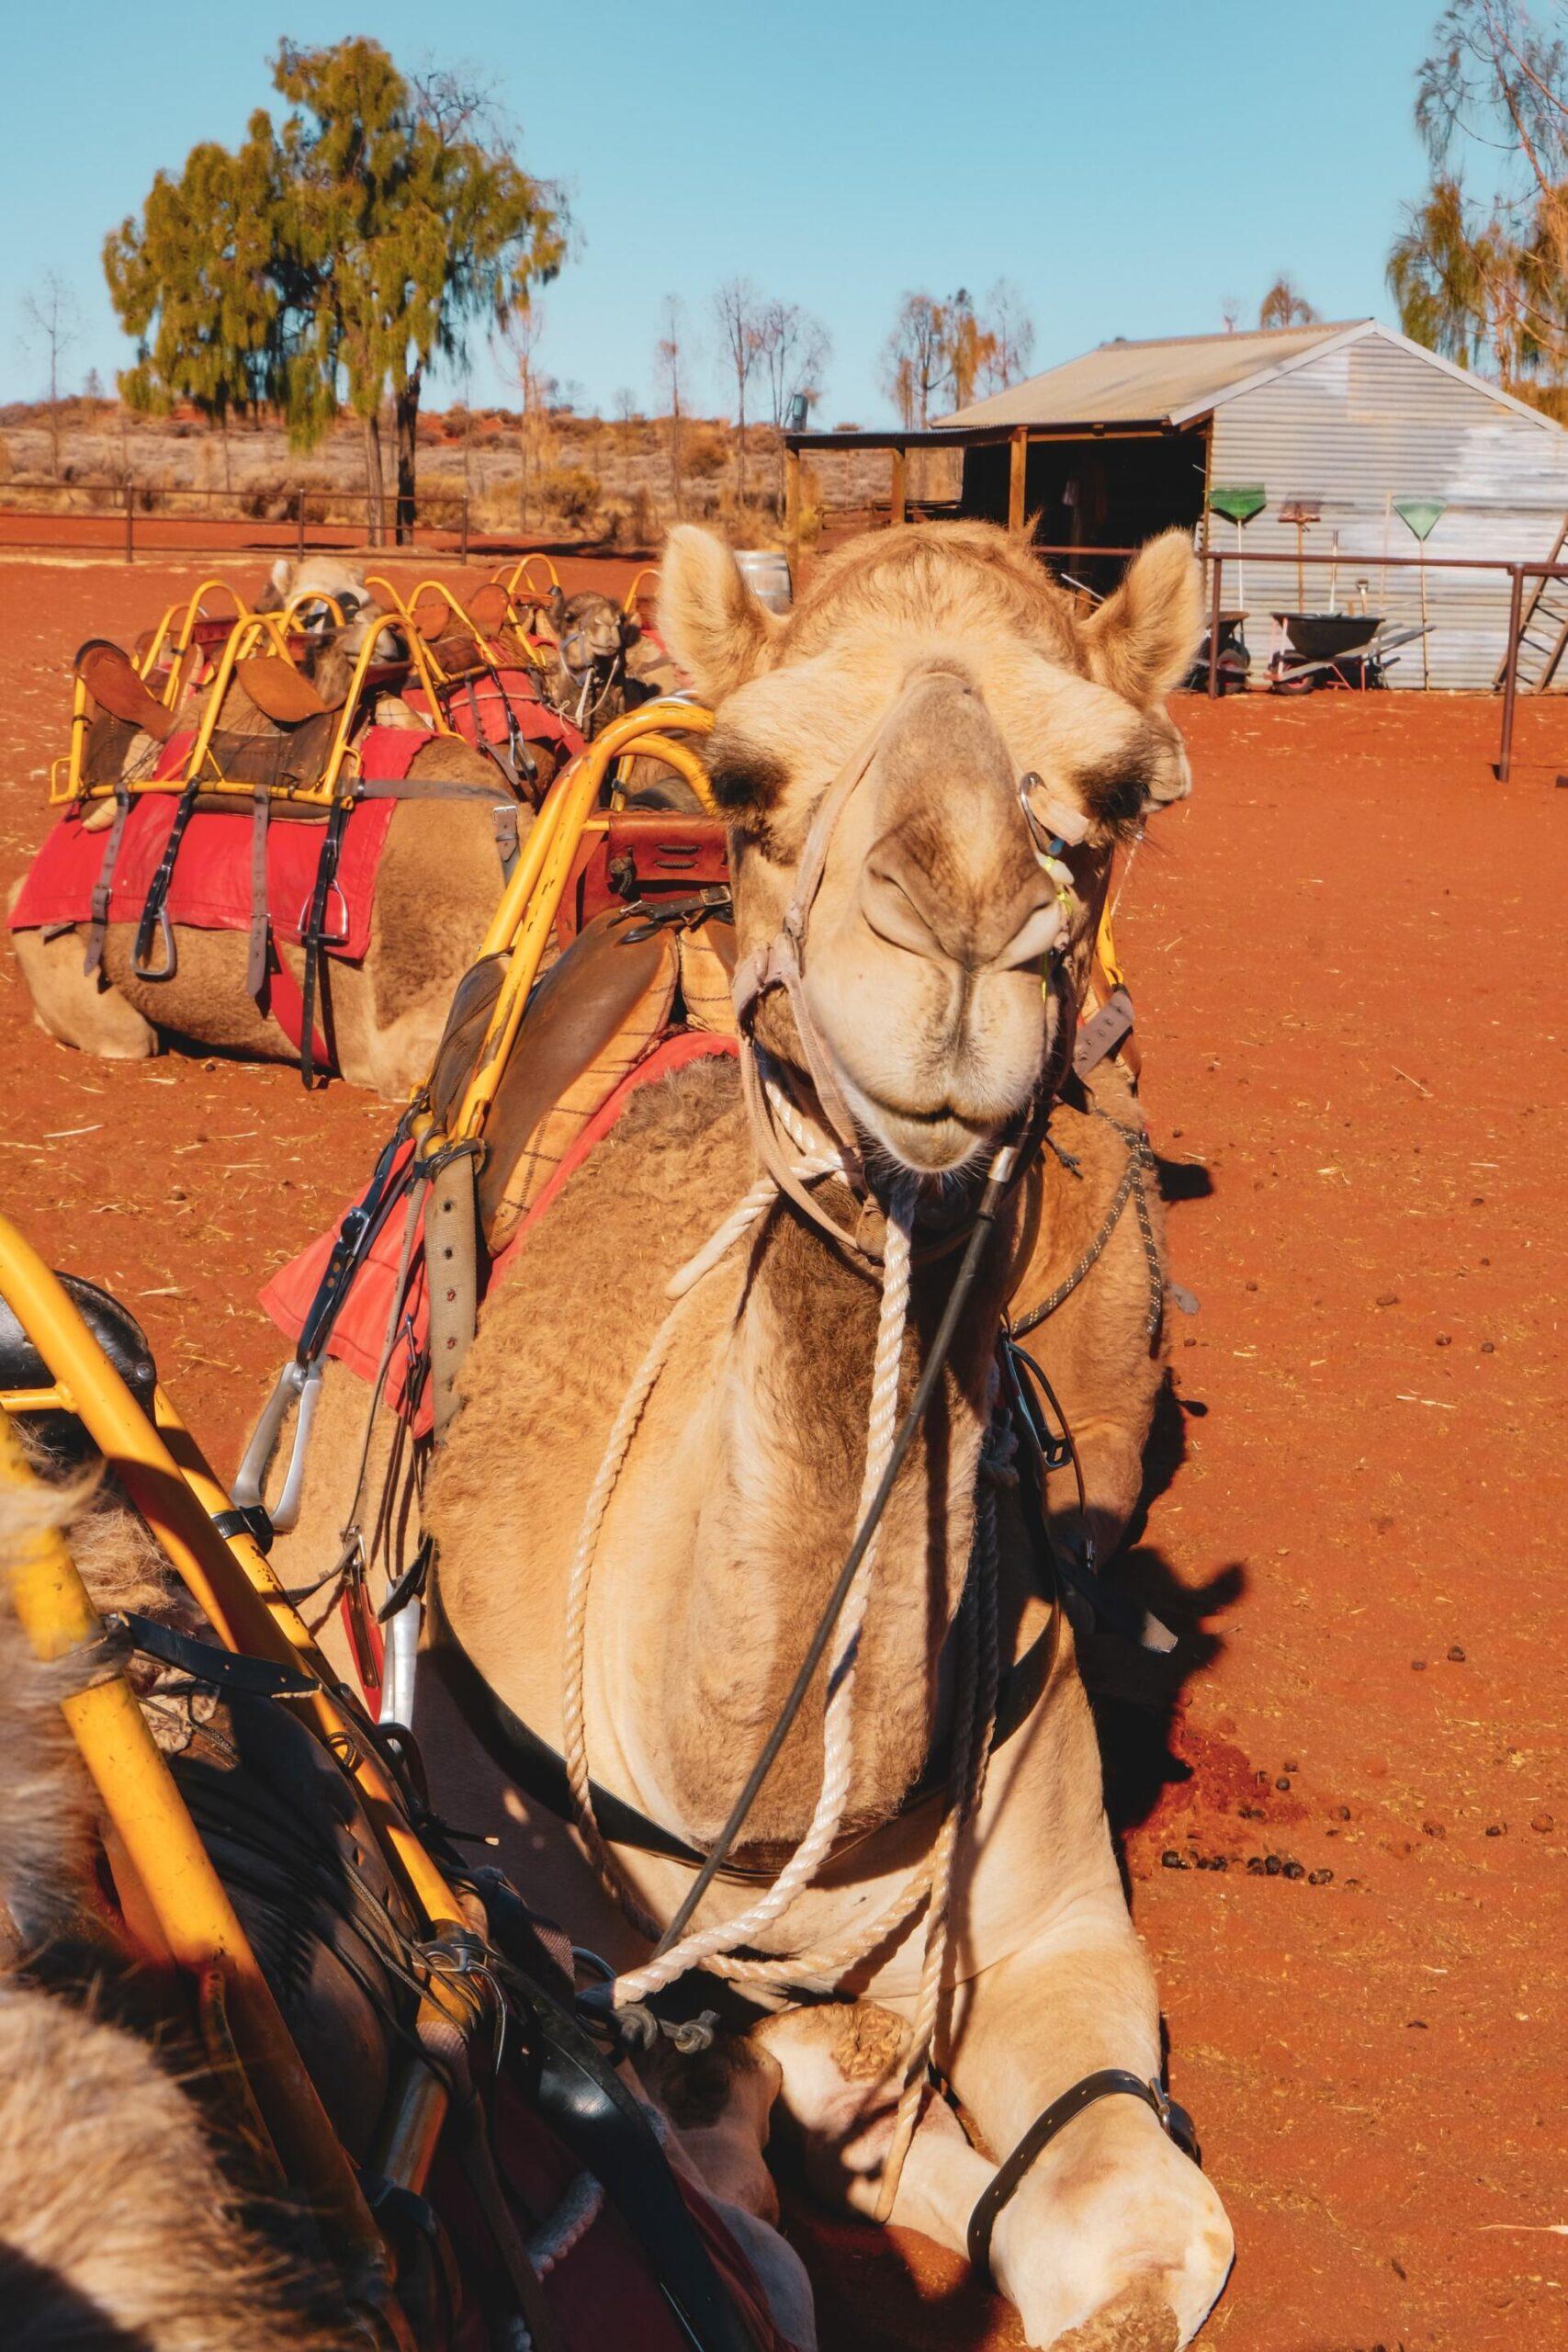 lucky the camel